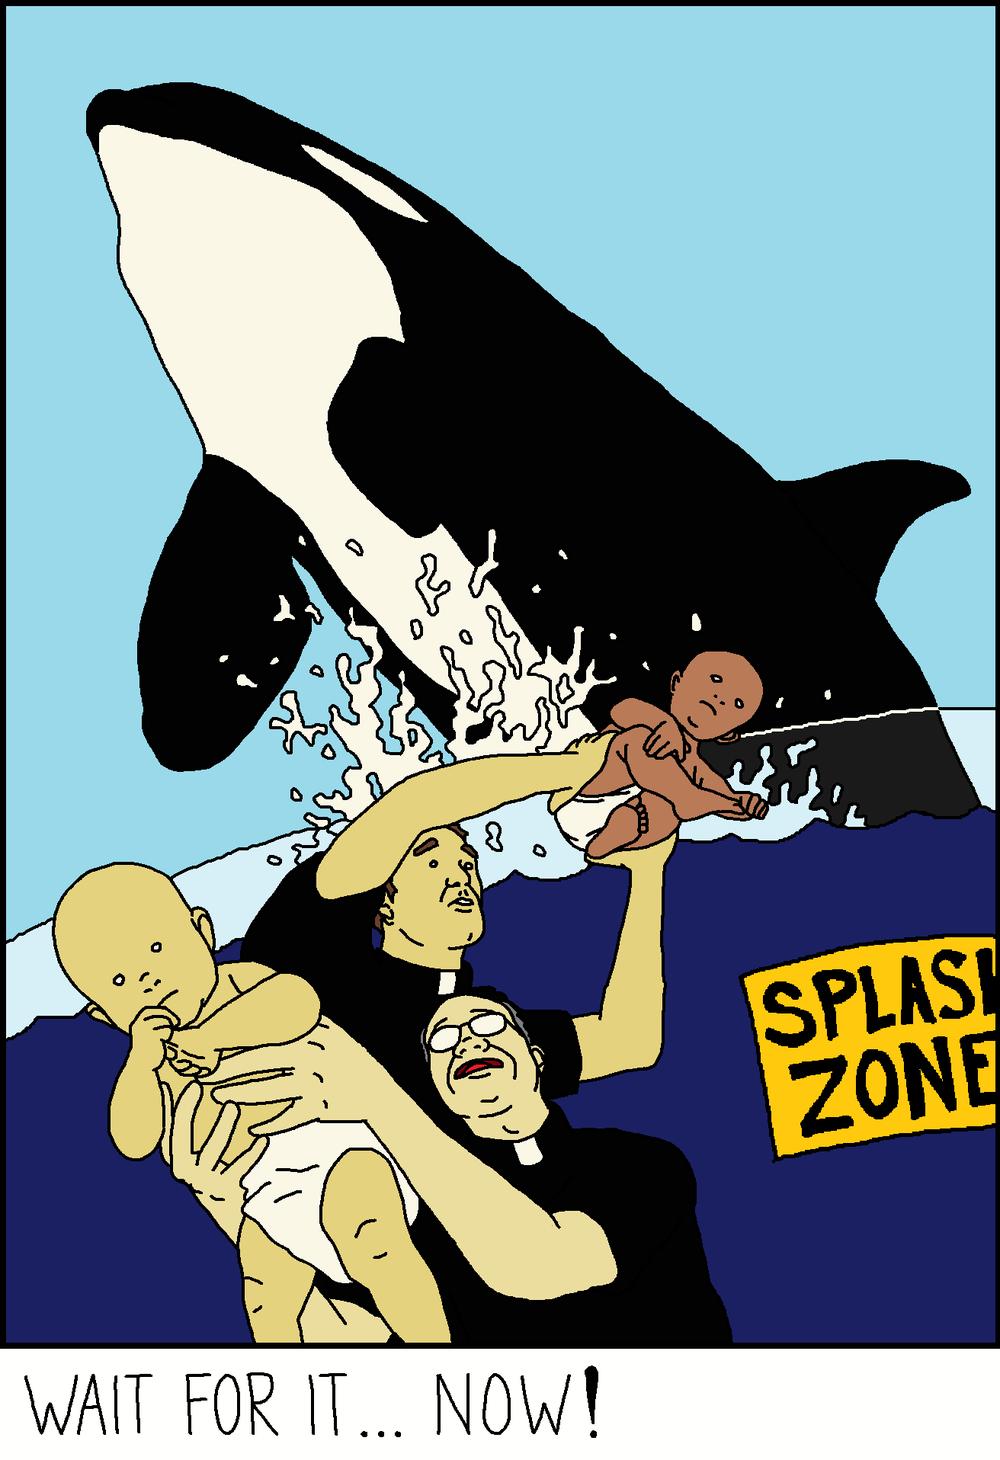 splashzone.png